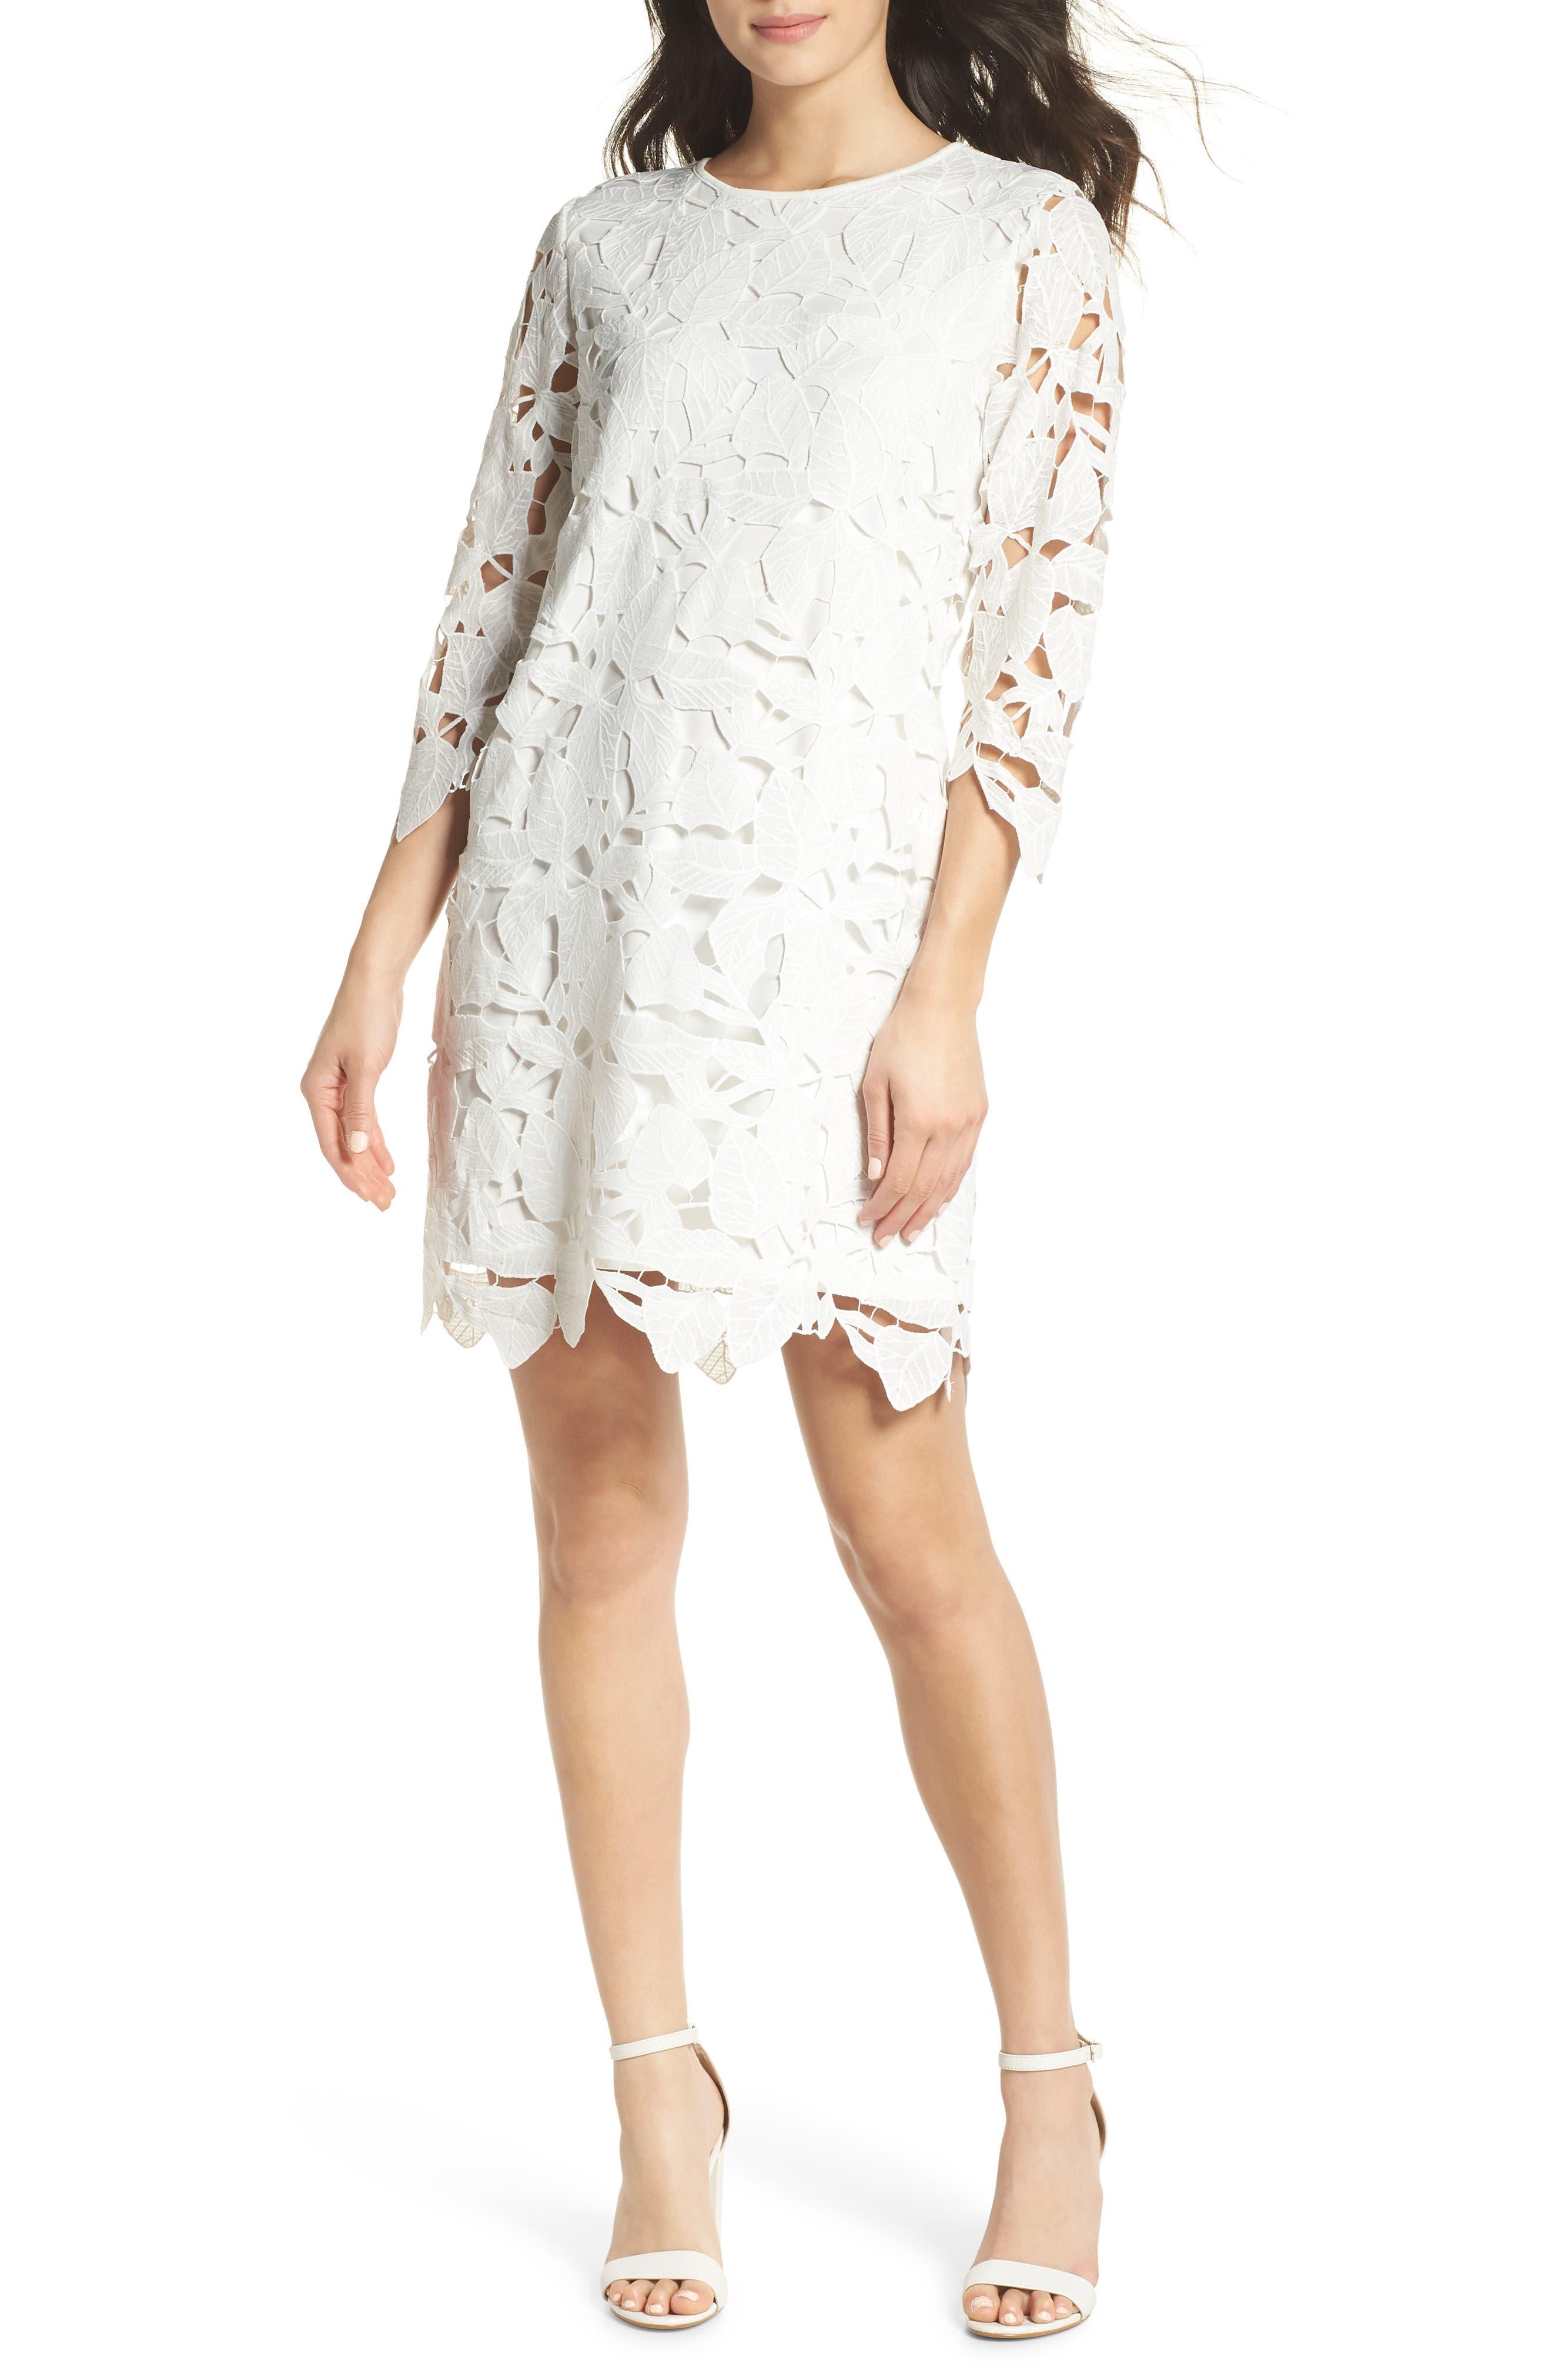 Skye Lace Shift Dress,                             Main thumbnail 1, color,                             100